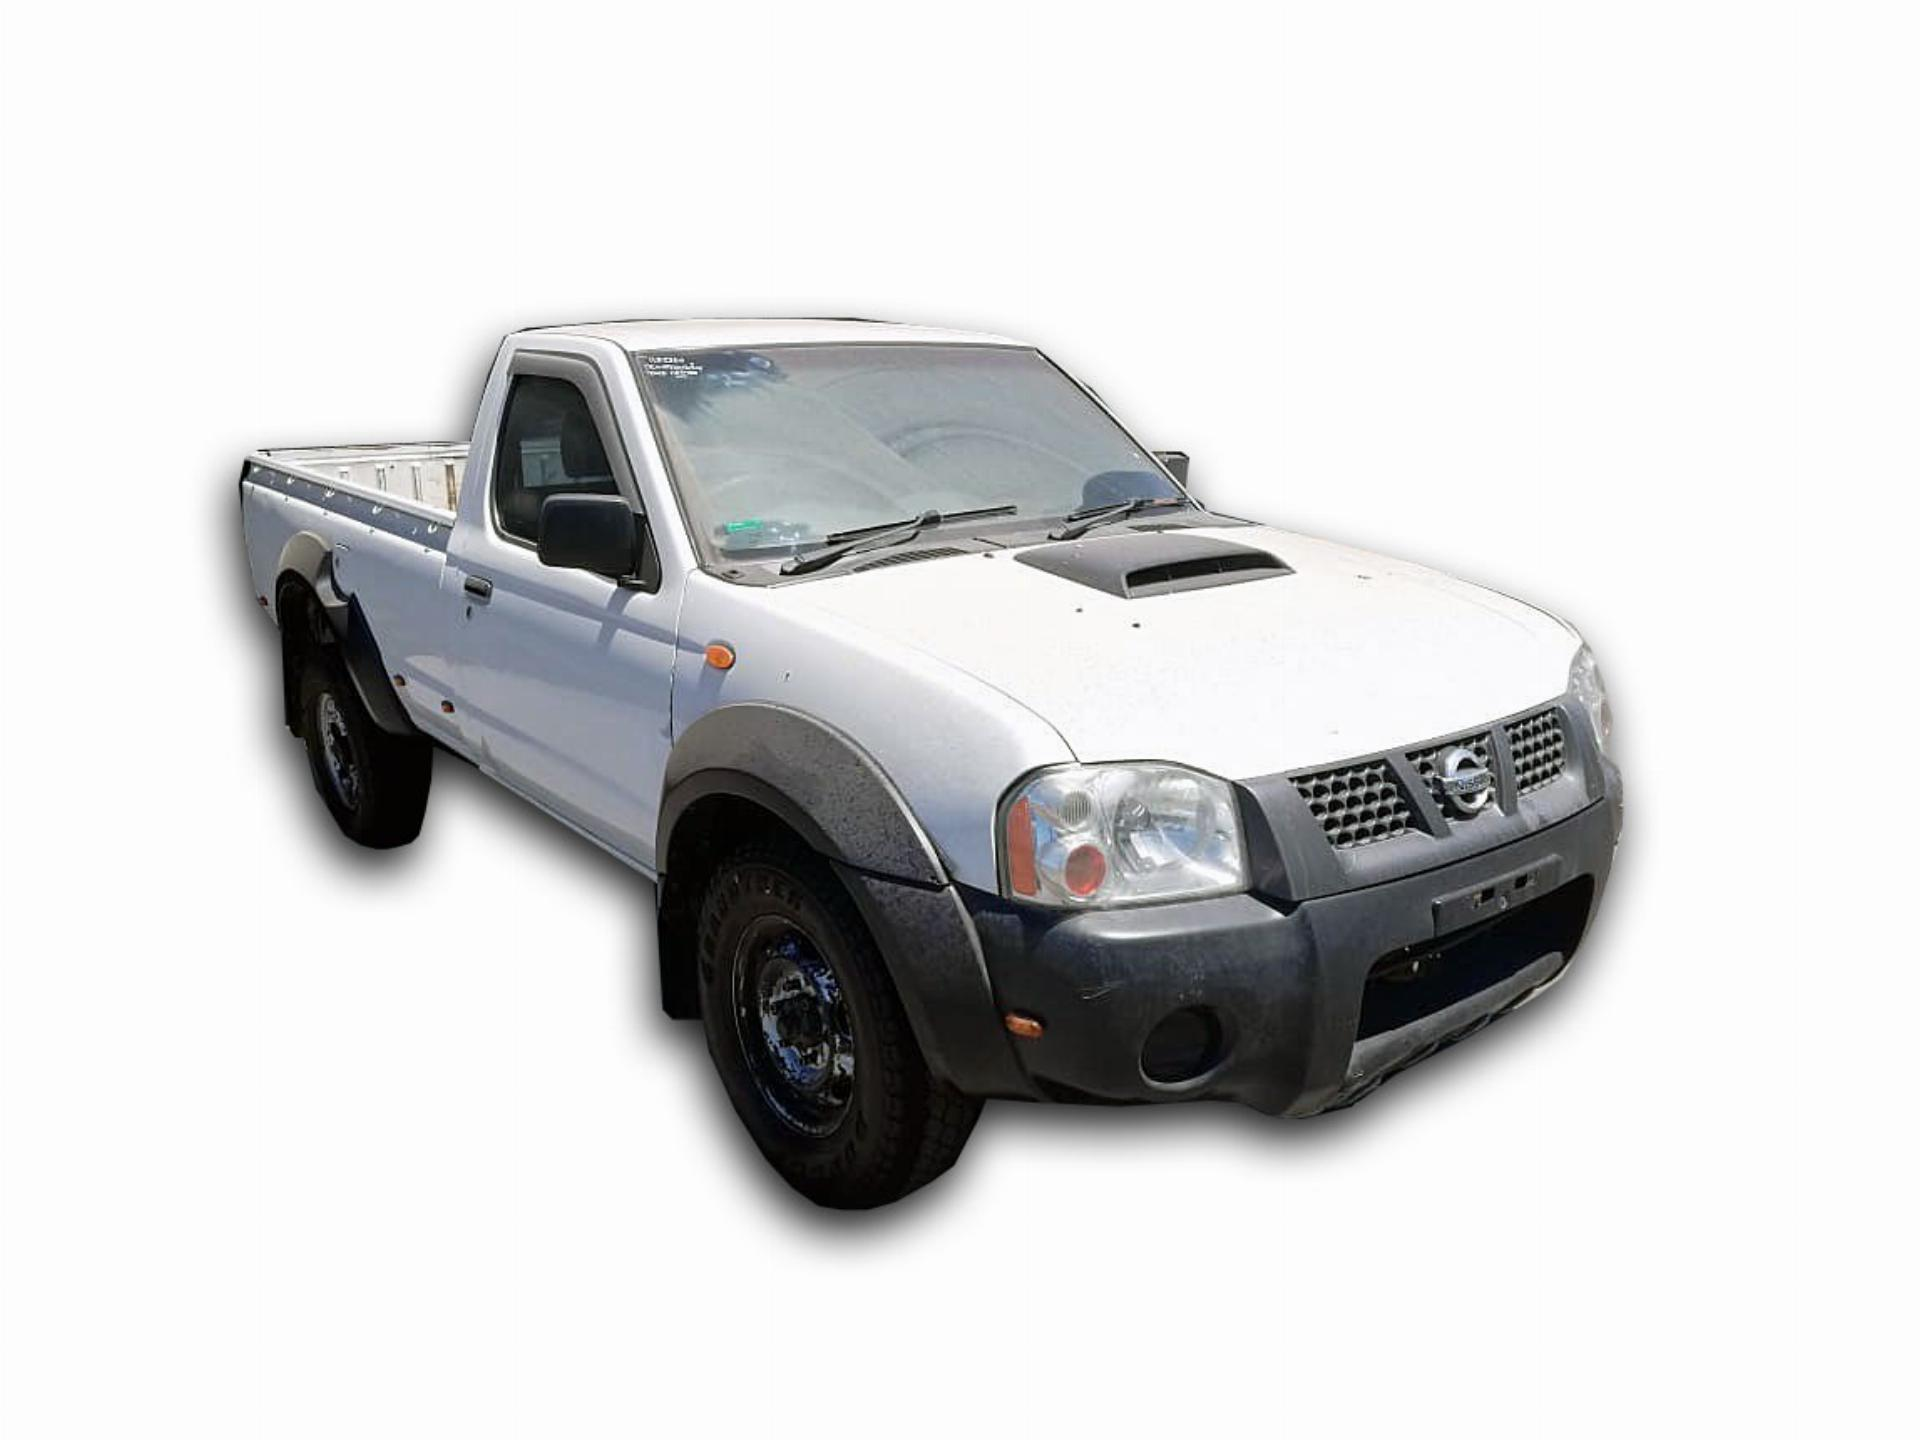 Nissan Hardbody NP300 2.5TDI LWB 4X4